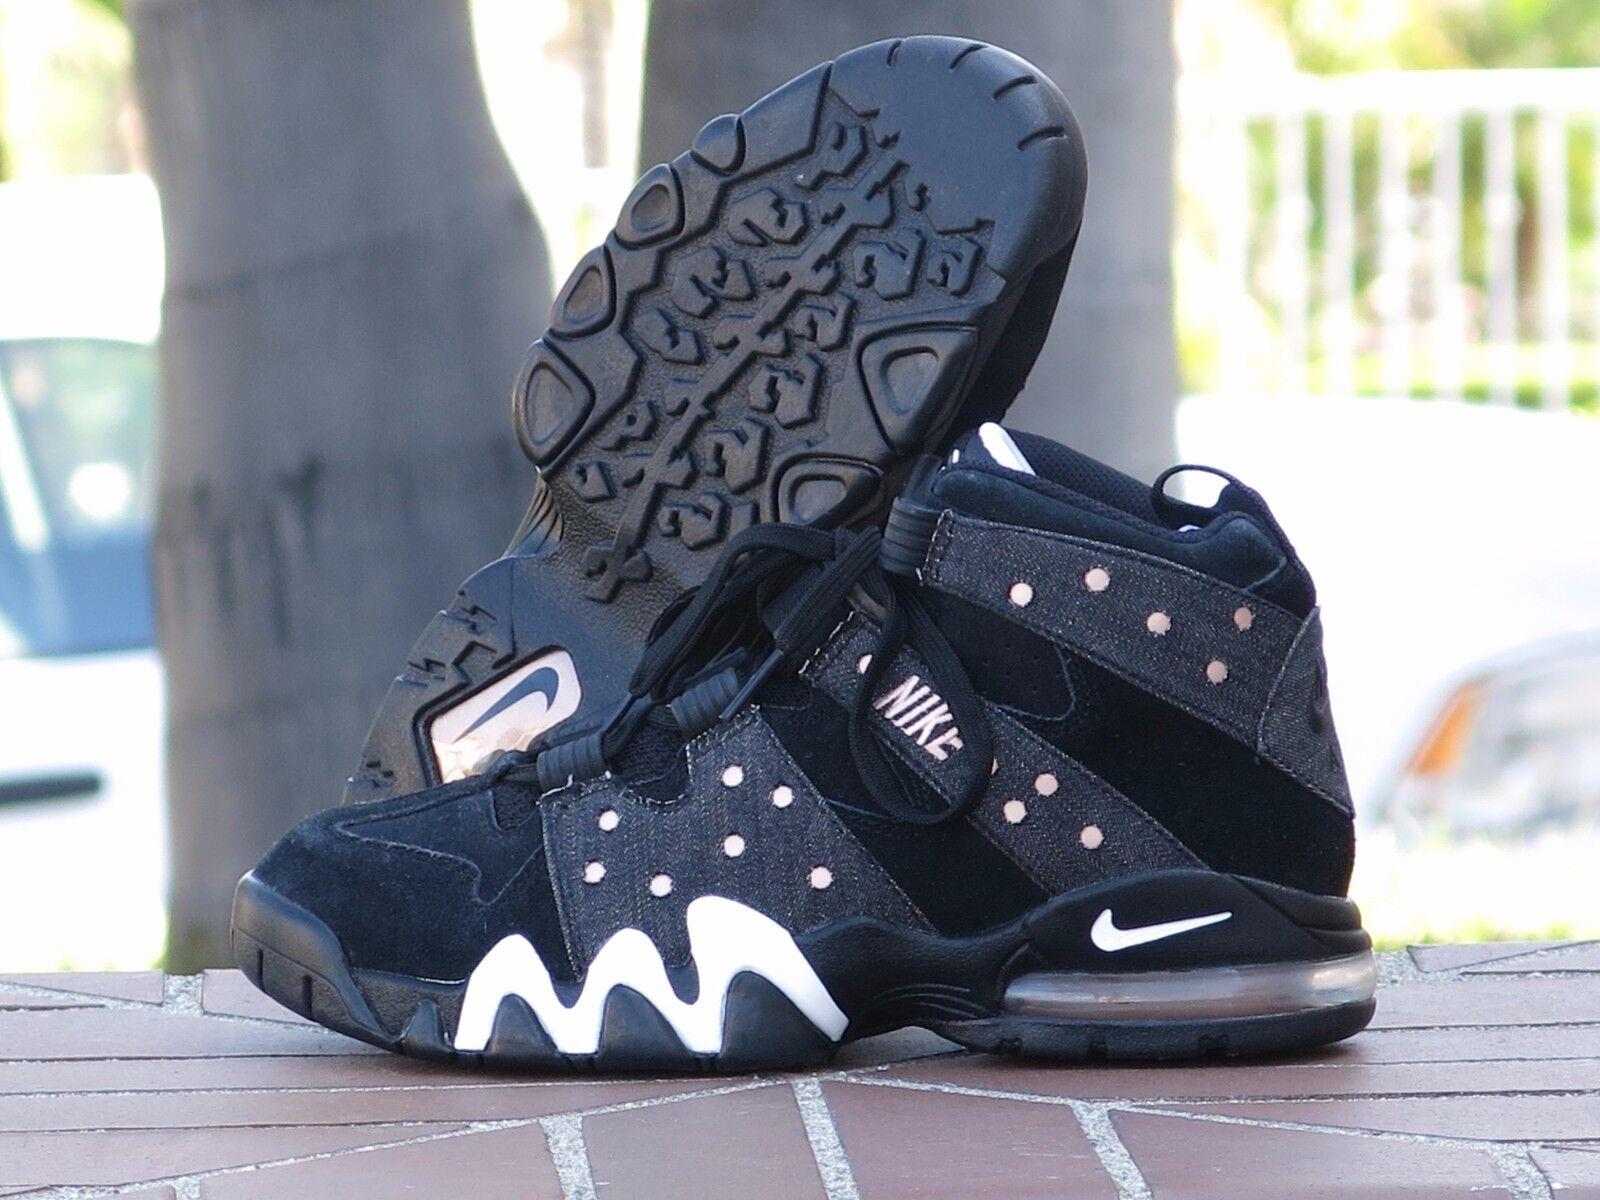 Nike Air Max2 CB 94 Men's Basketball Shoes Charles Barkley 305440-004 SZ 10